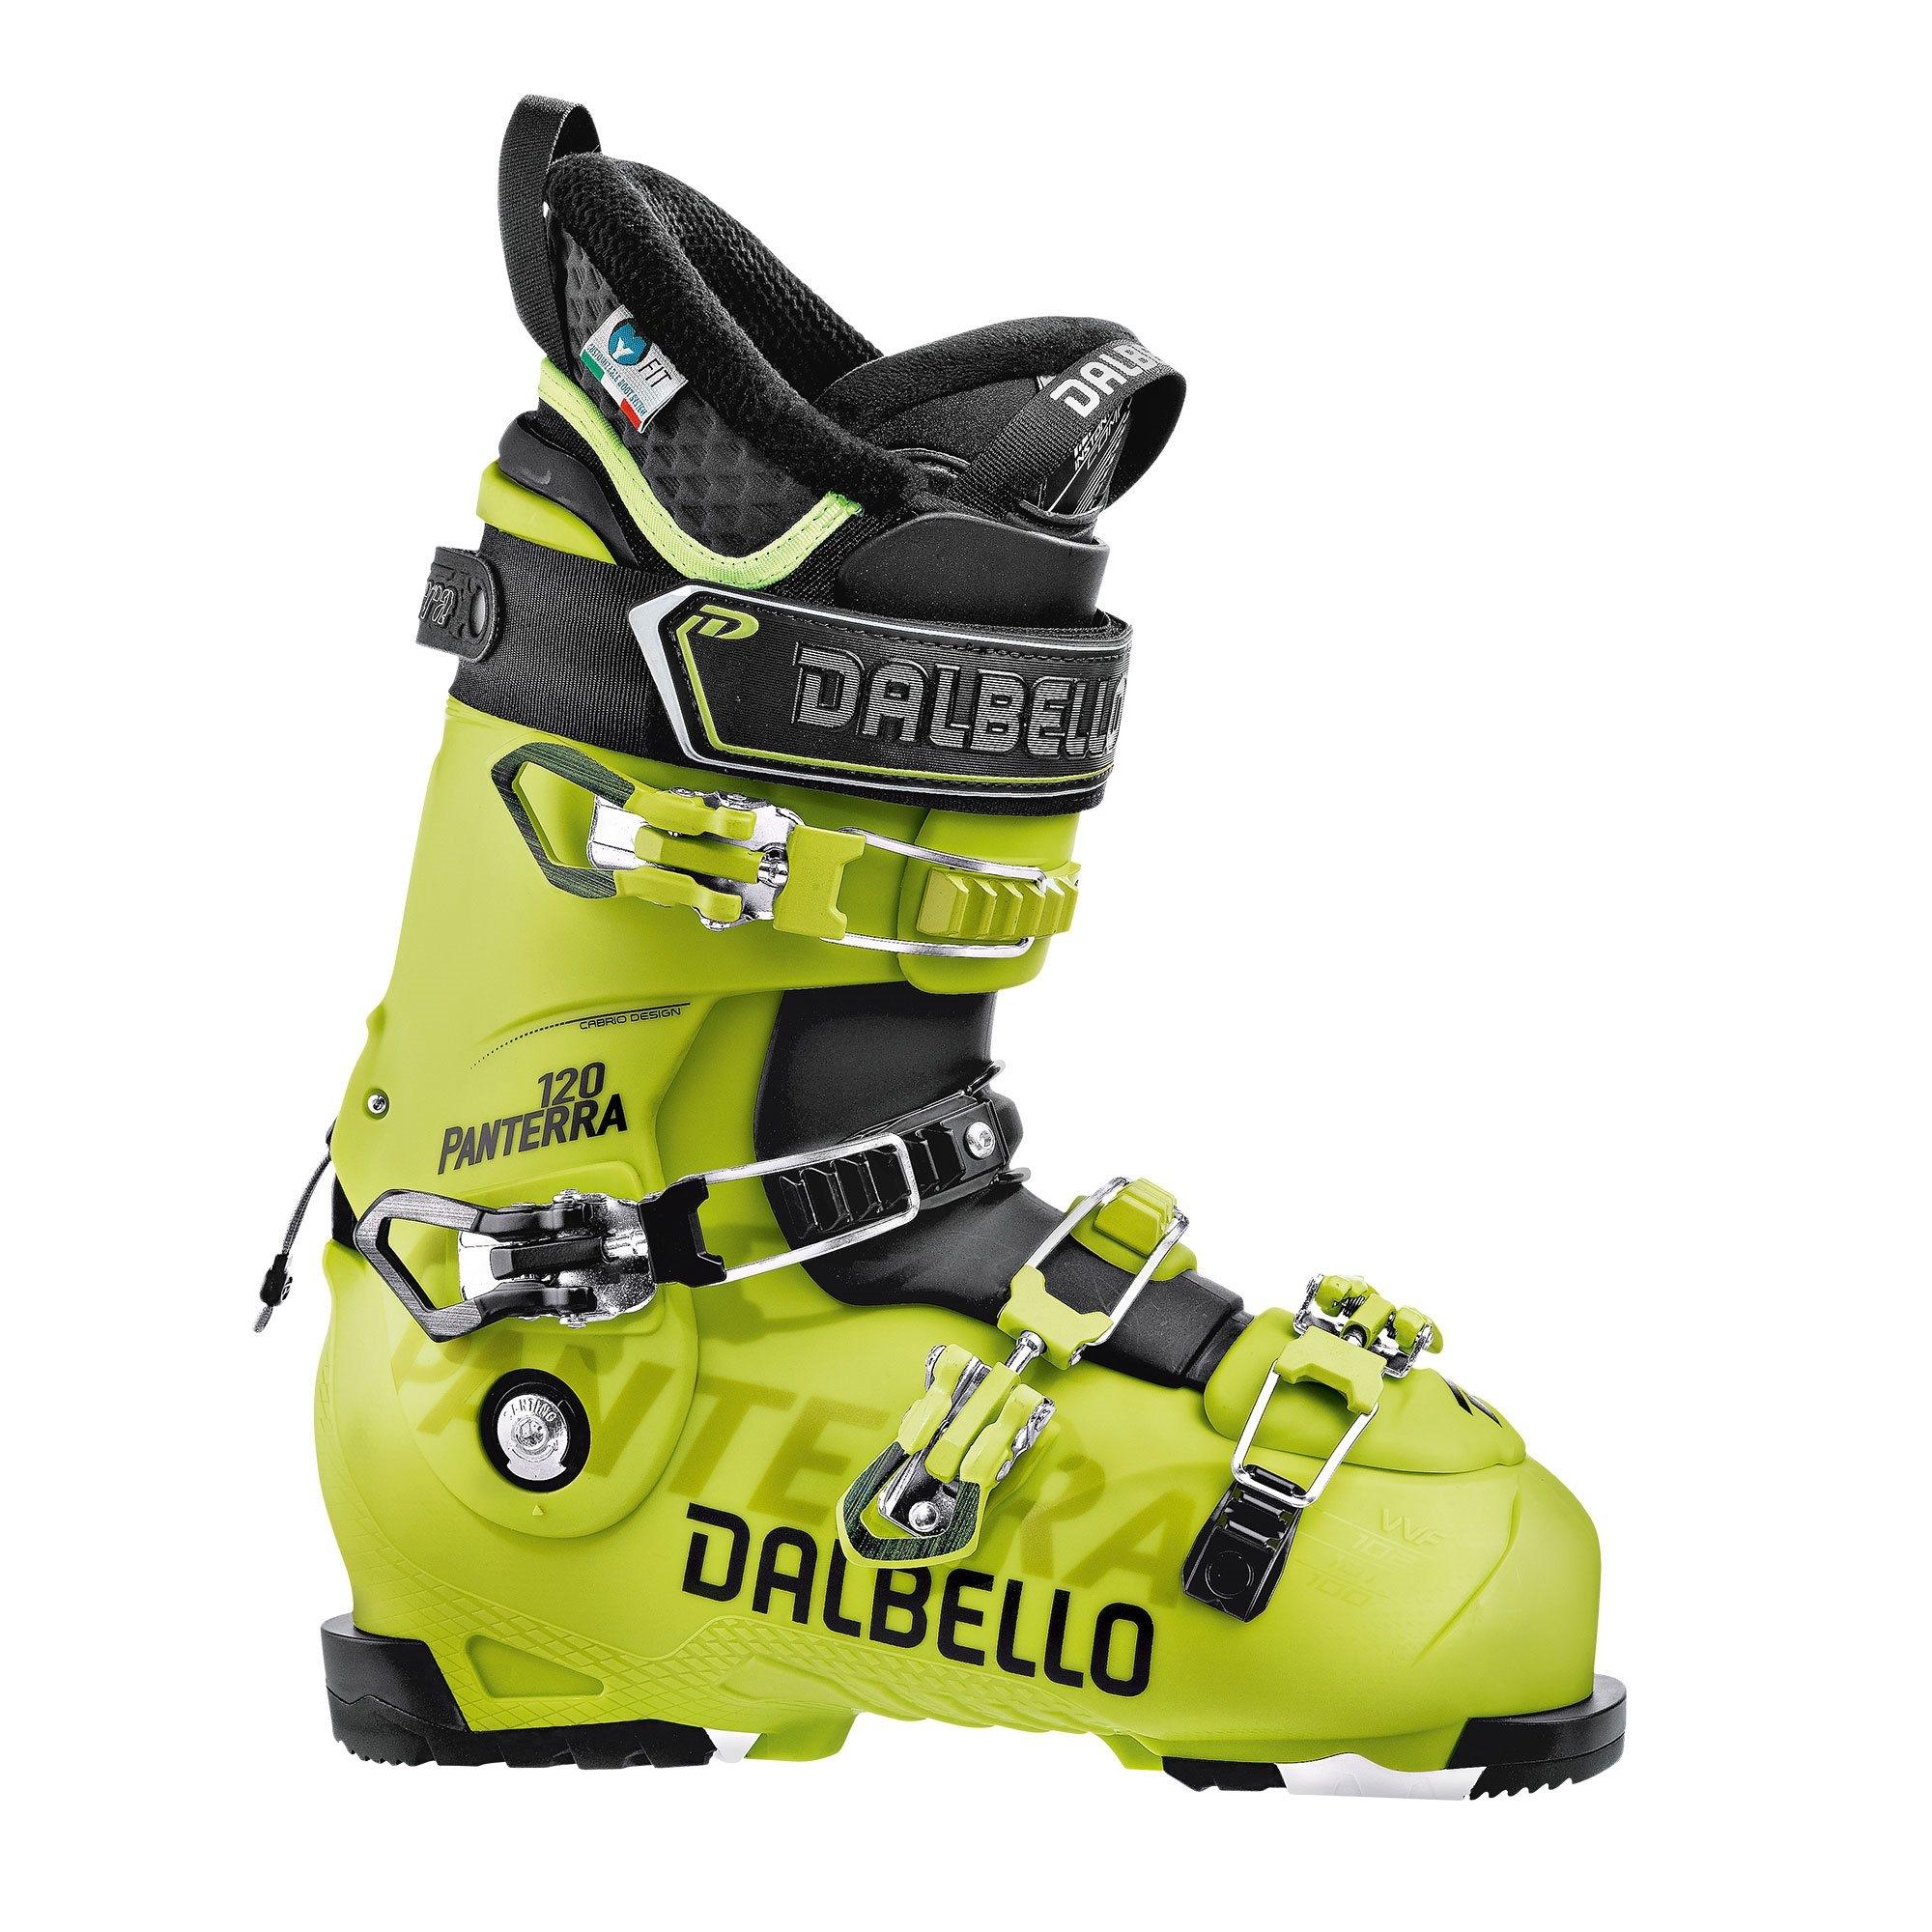 Dalbello Panterra 120 Ski Boot Acid Yellow/Black 2018